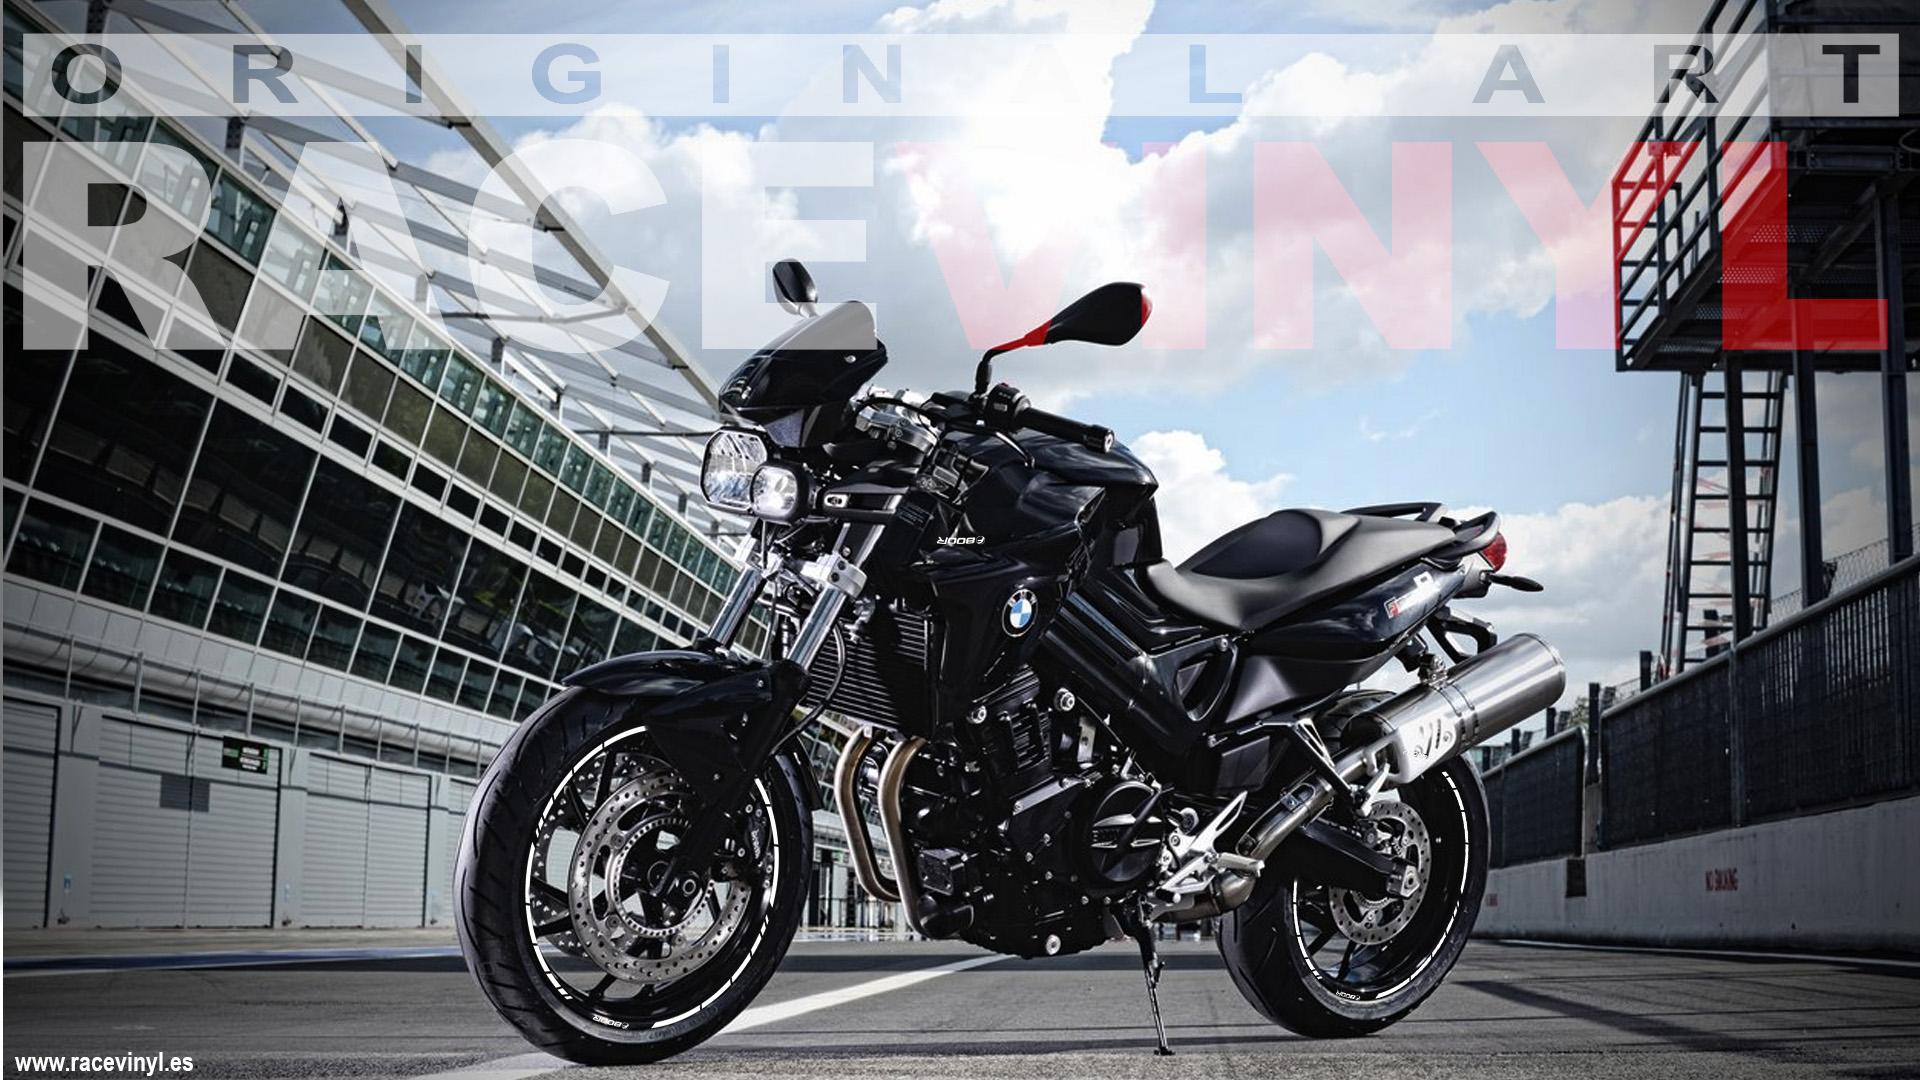 Wallpaper-02-BMW-F-800-R-F800R-adhesivo-pegatina-vinilo-llanta-rueda-moto-sticker-vinyl-rim-stripe.jpg